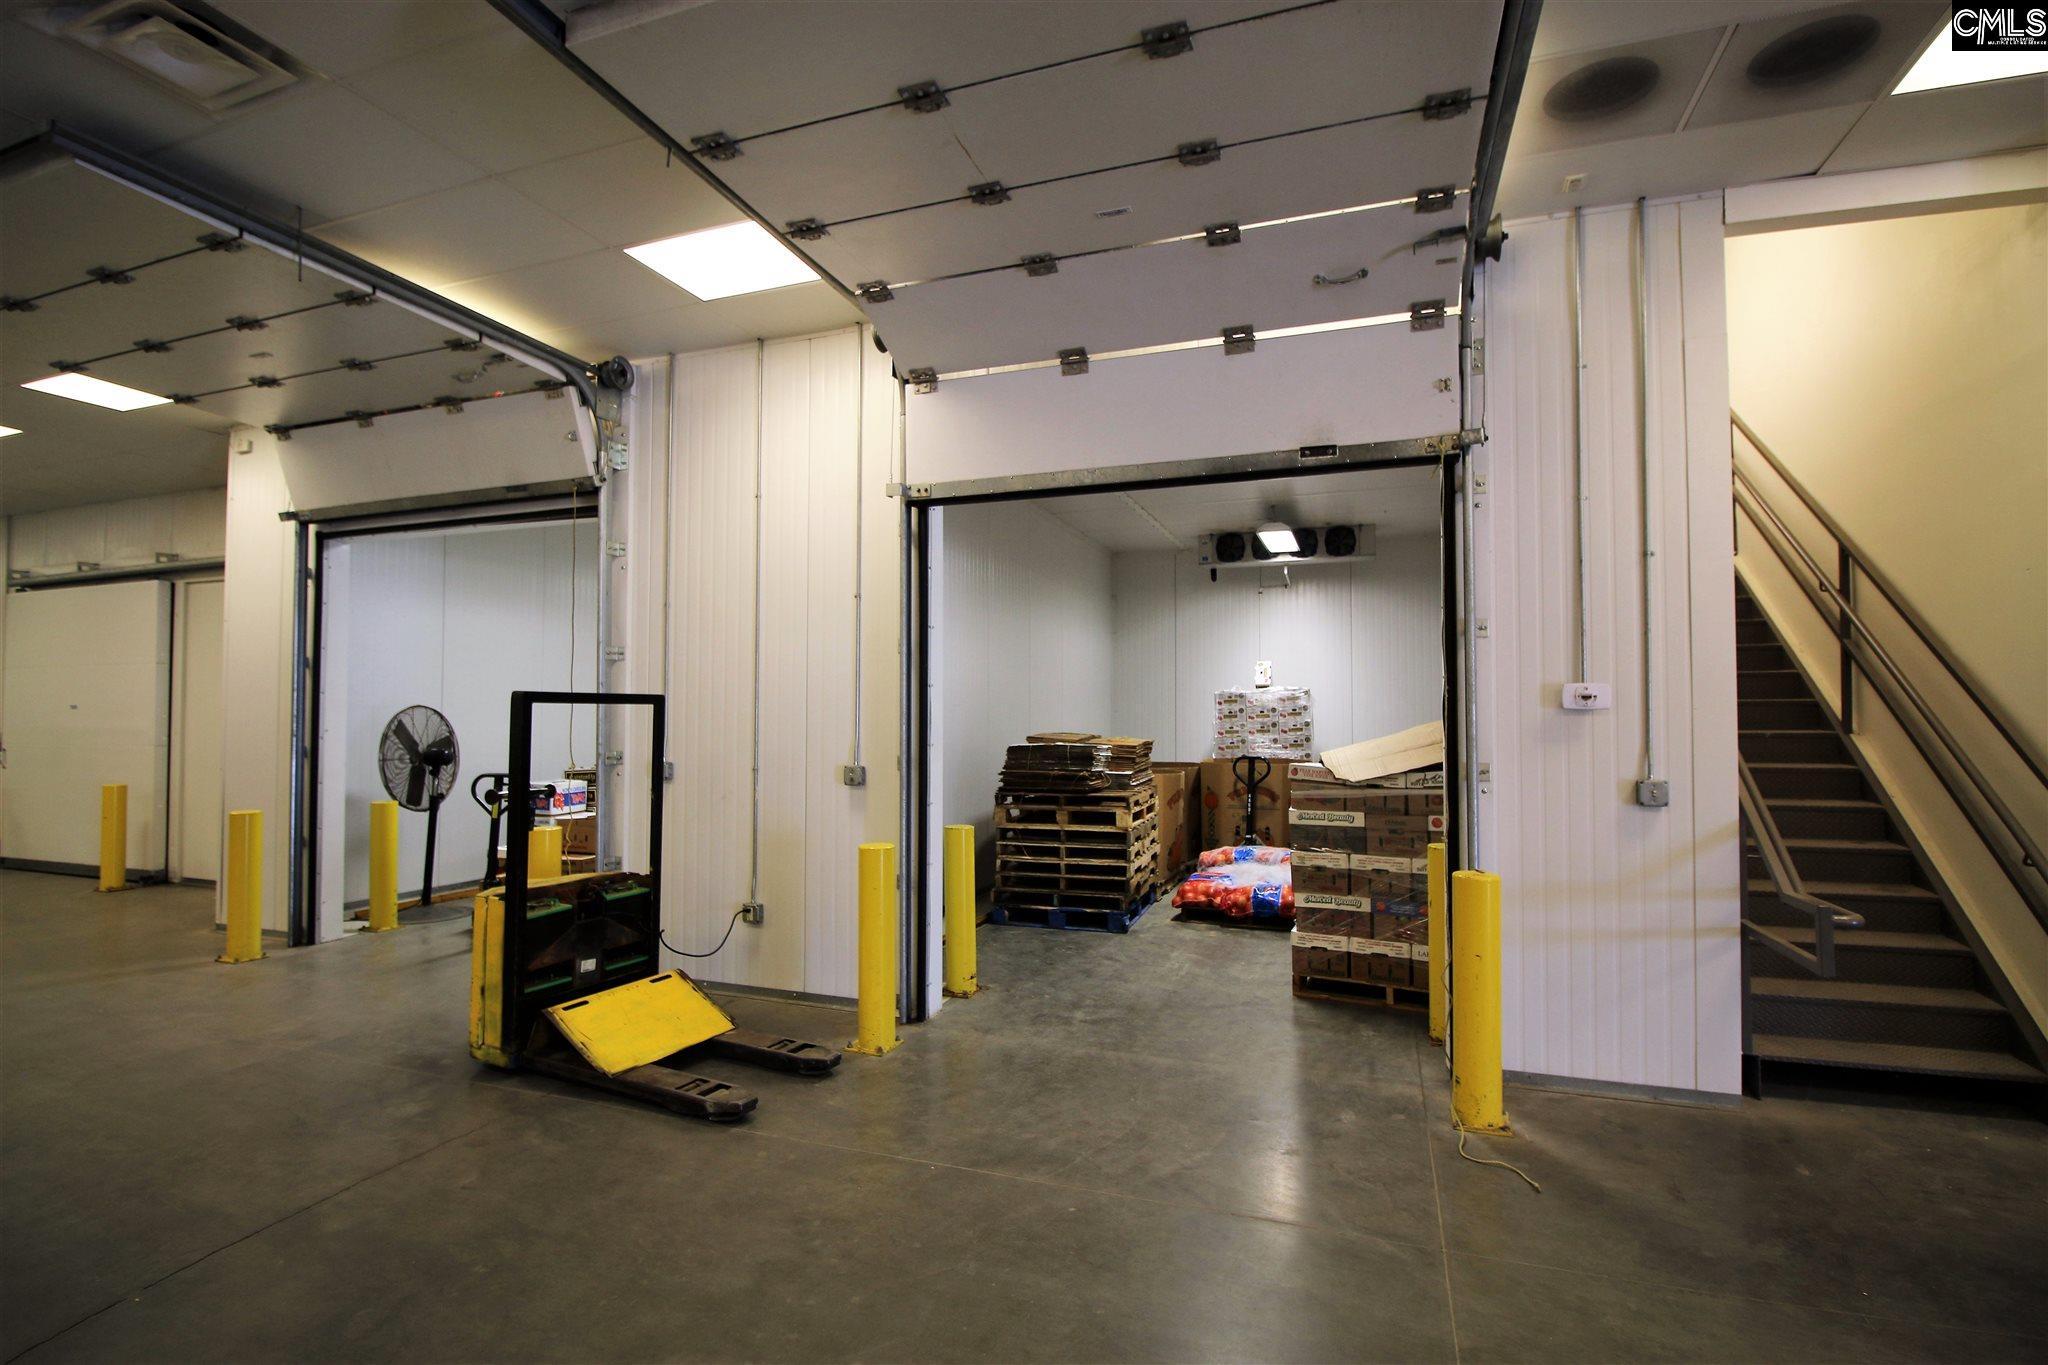 406  Wholesale West Columbia, SC 29172